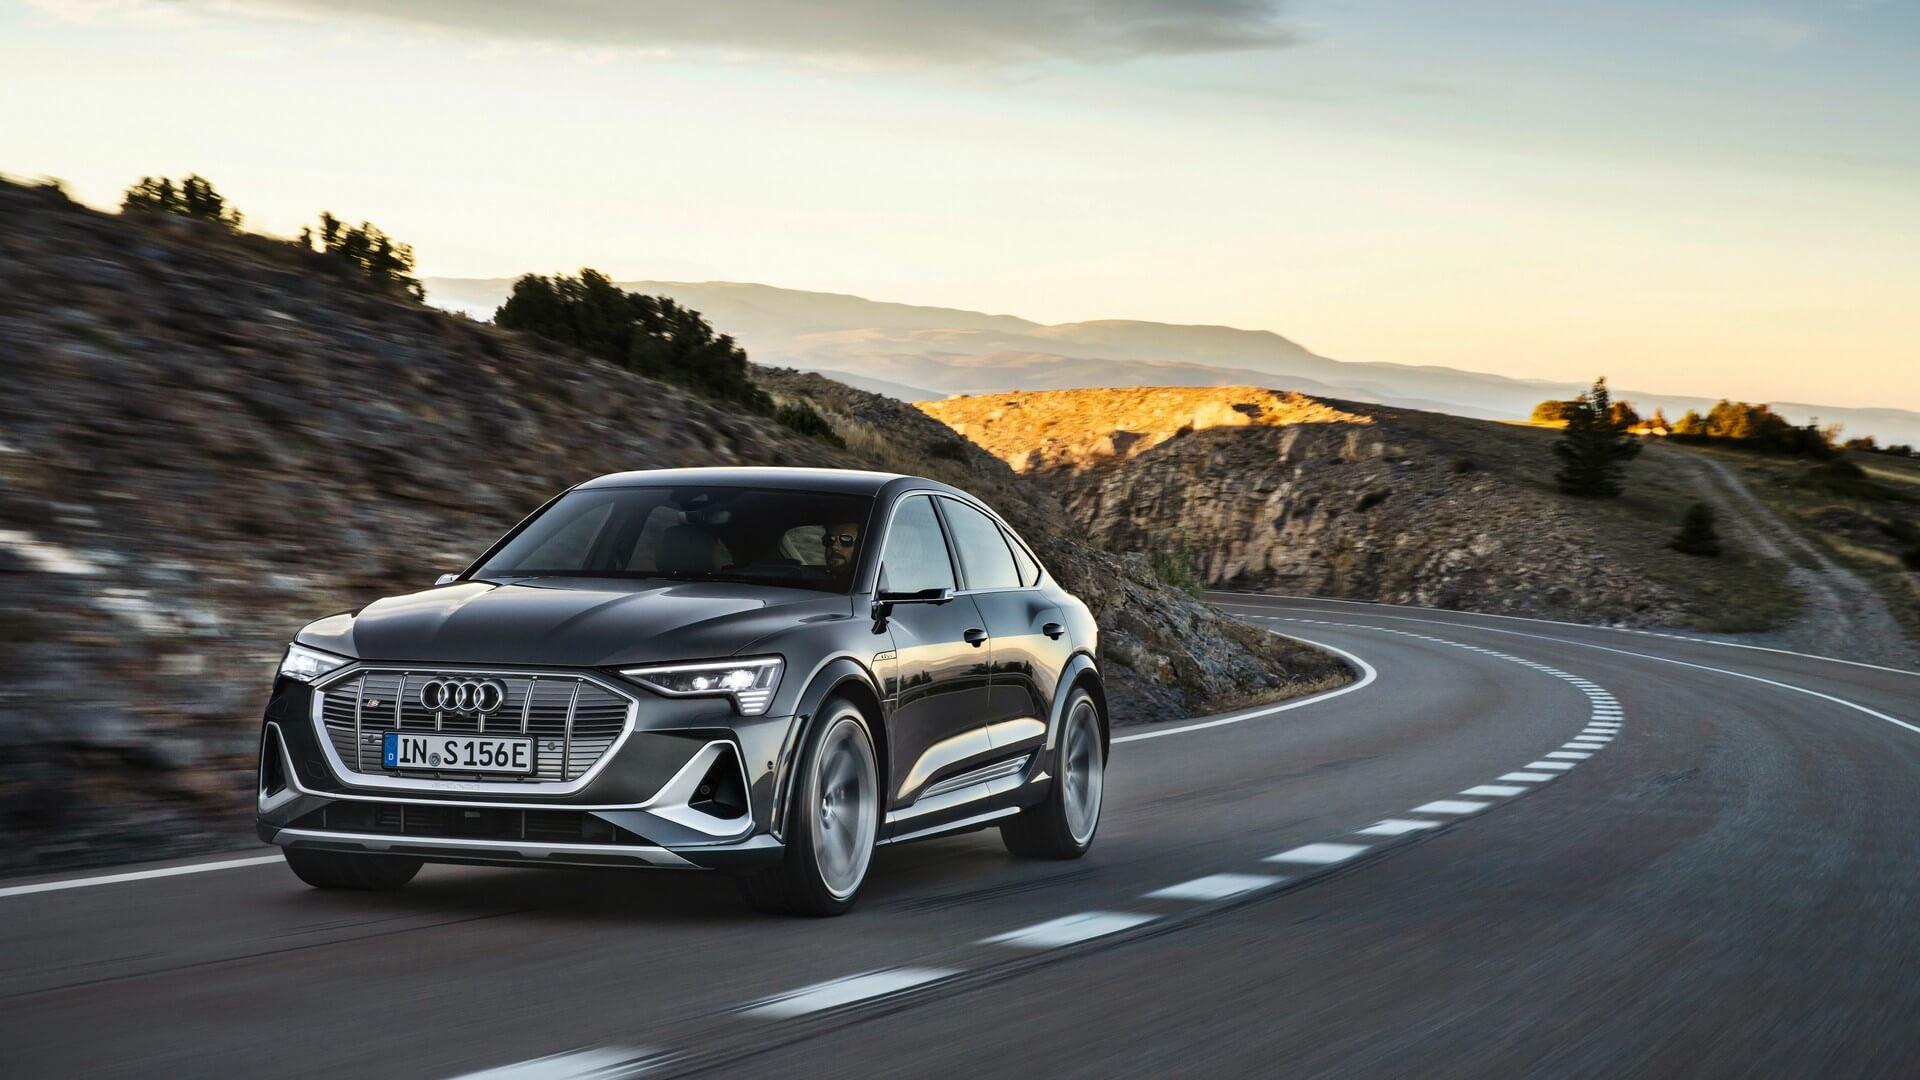 Audi-E-Tron-S-and-E-Tron-S-Sportback-2020-48